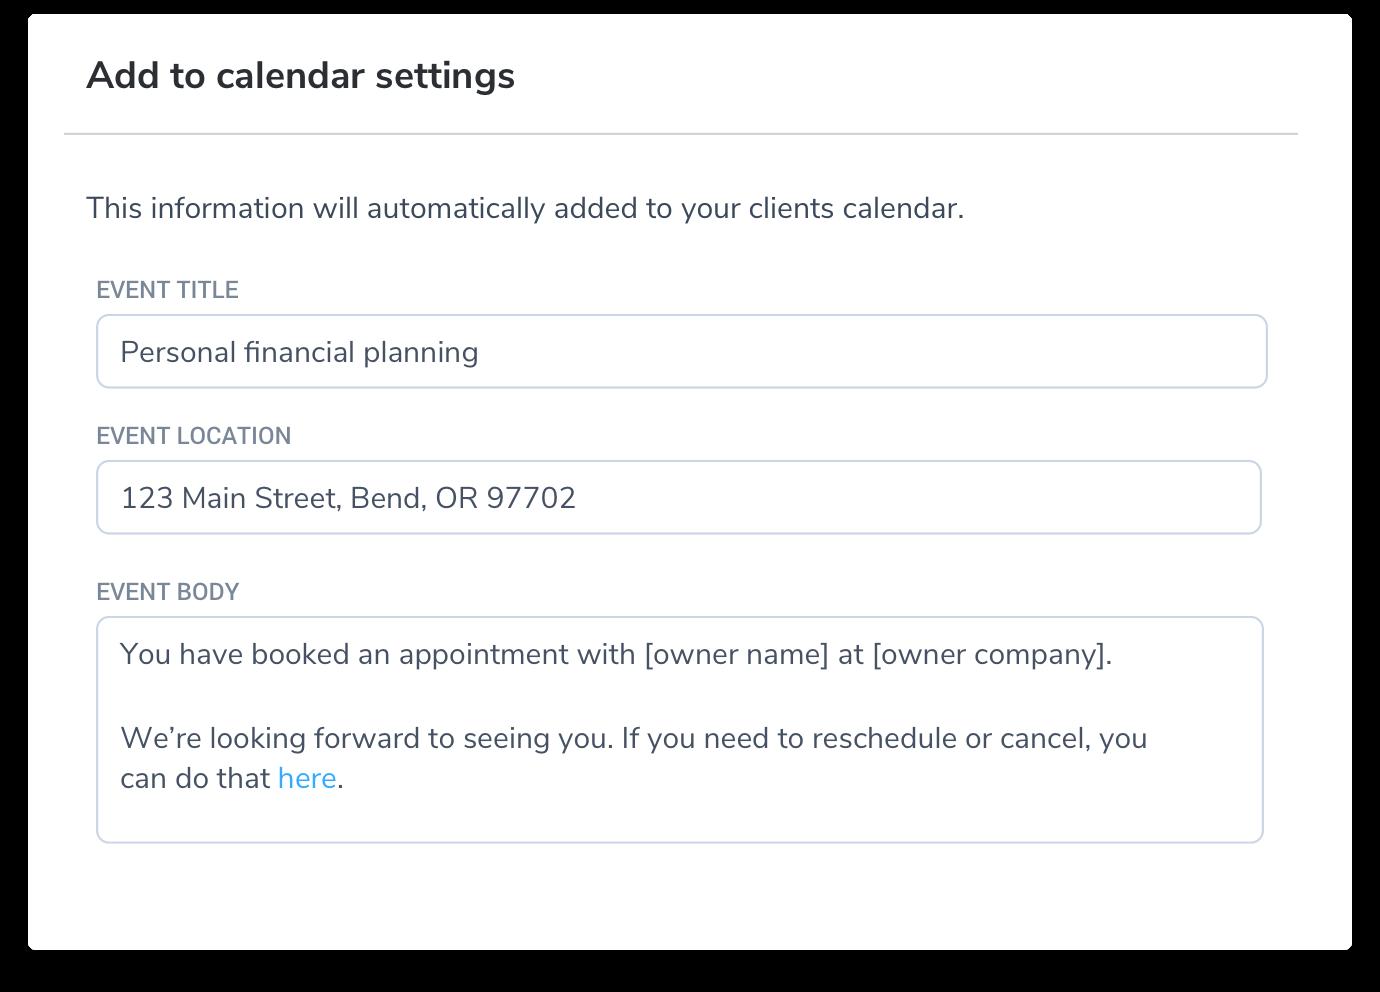 custom add to calendar content